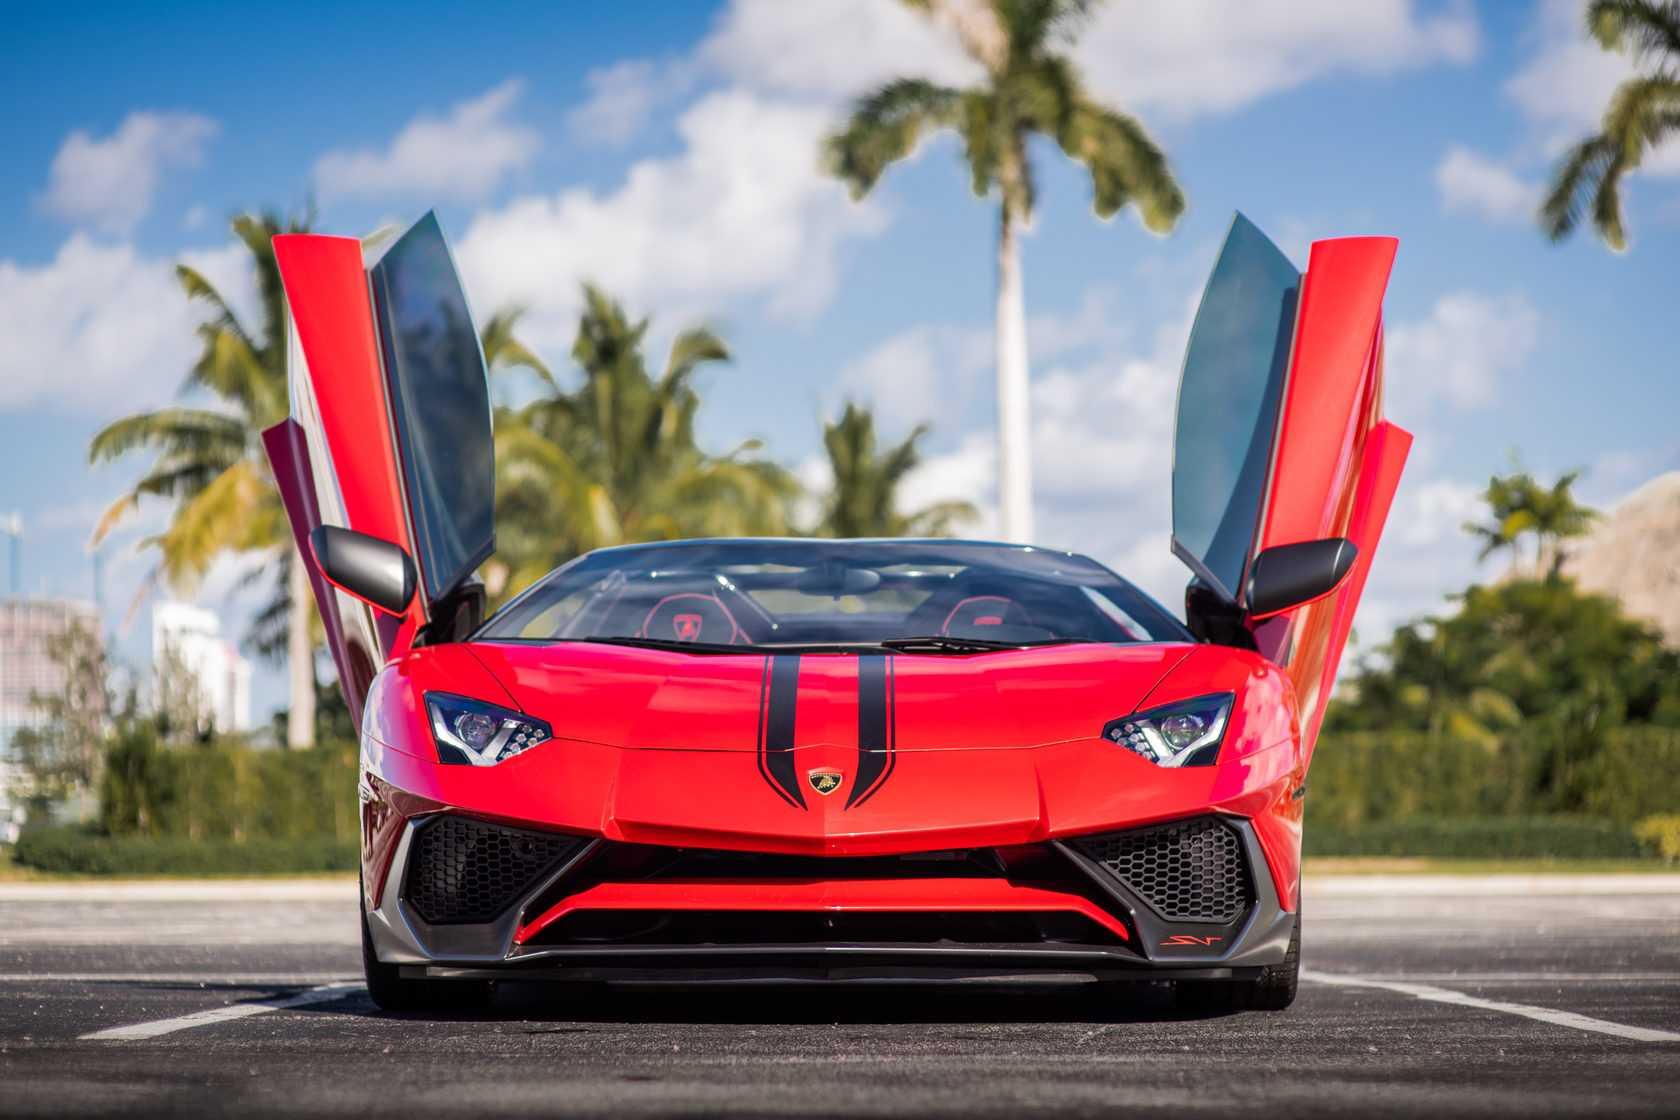 Elite Cars In Fort Lauderdale